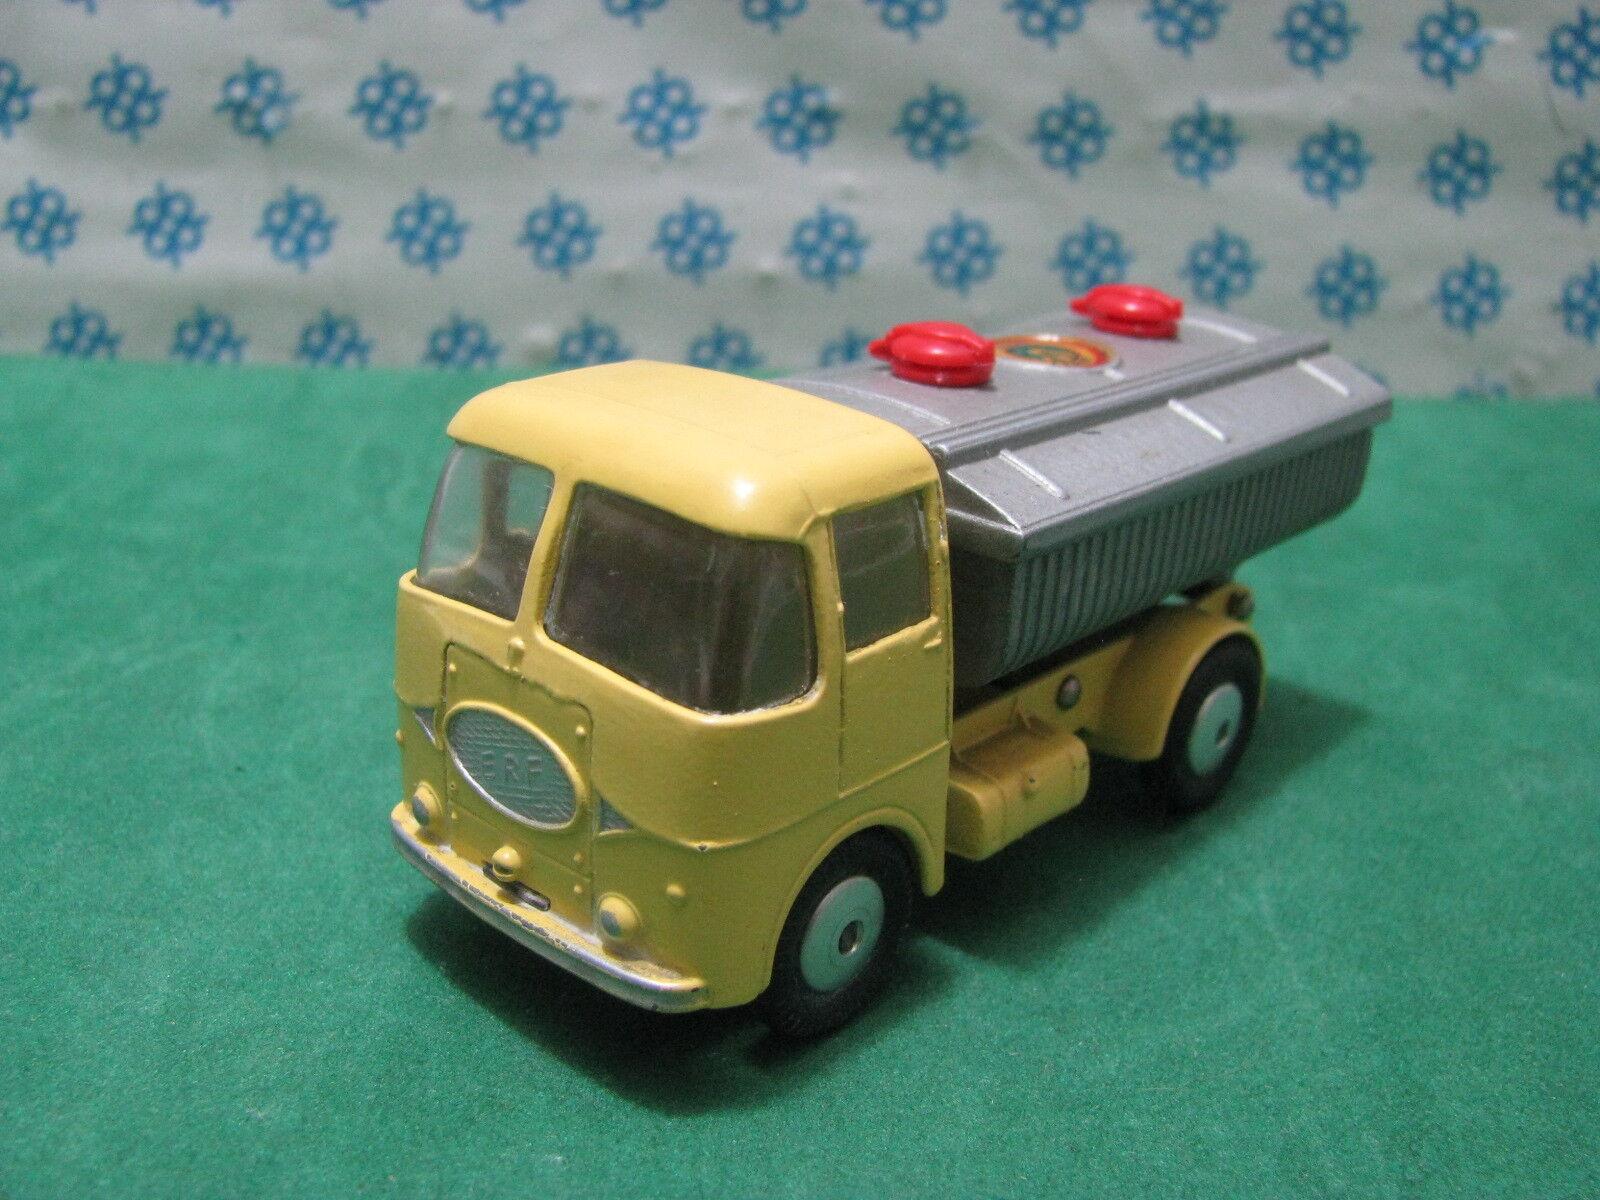 Vintage - E. R.f Model 64 - c. Toys 460 Mint